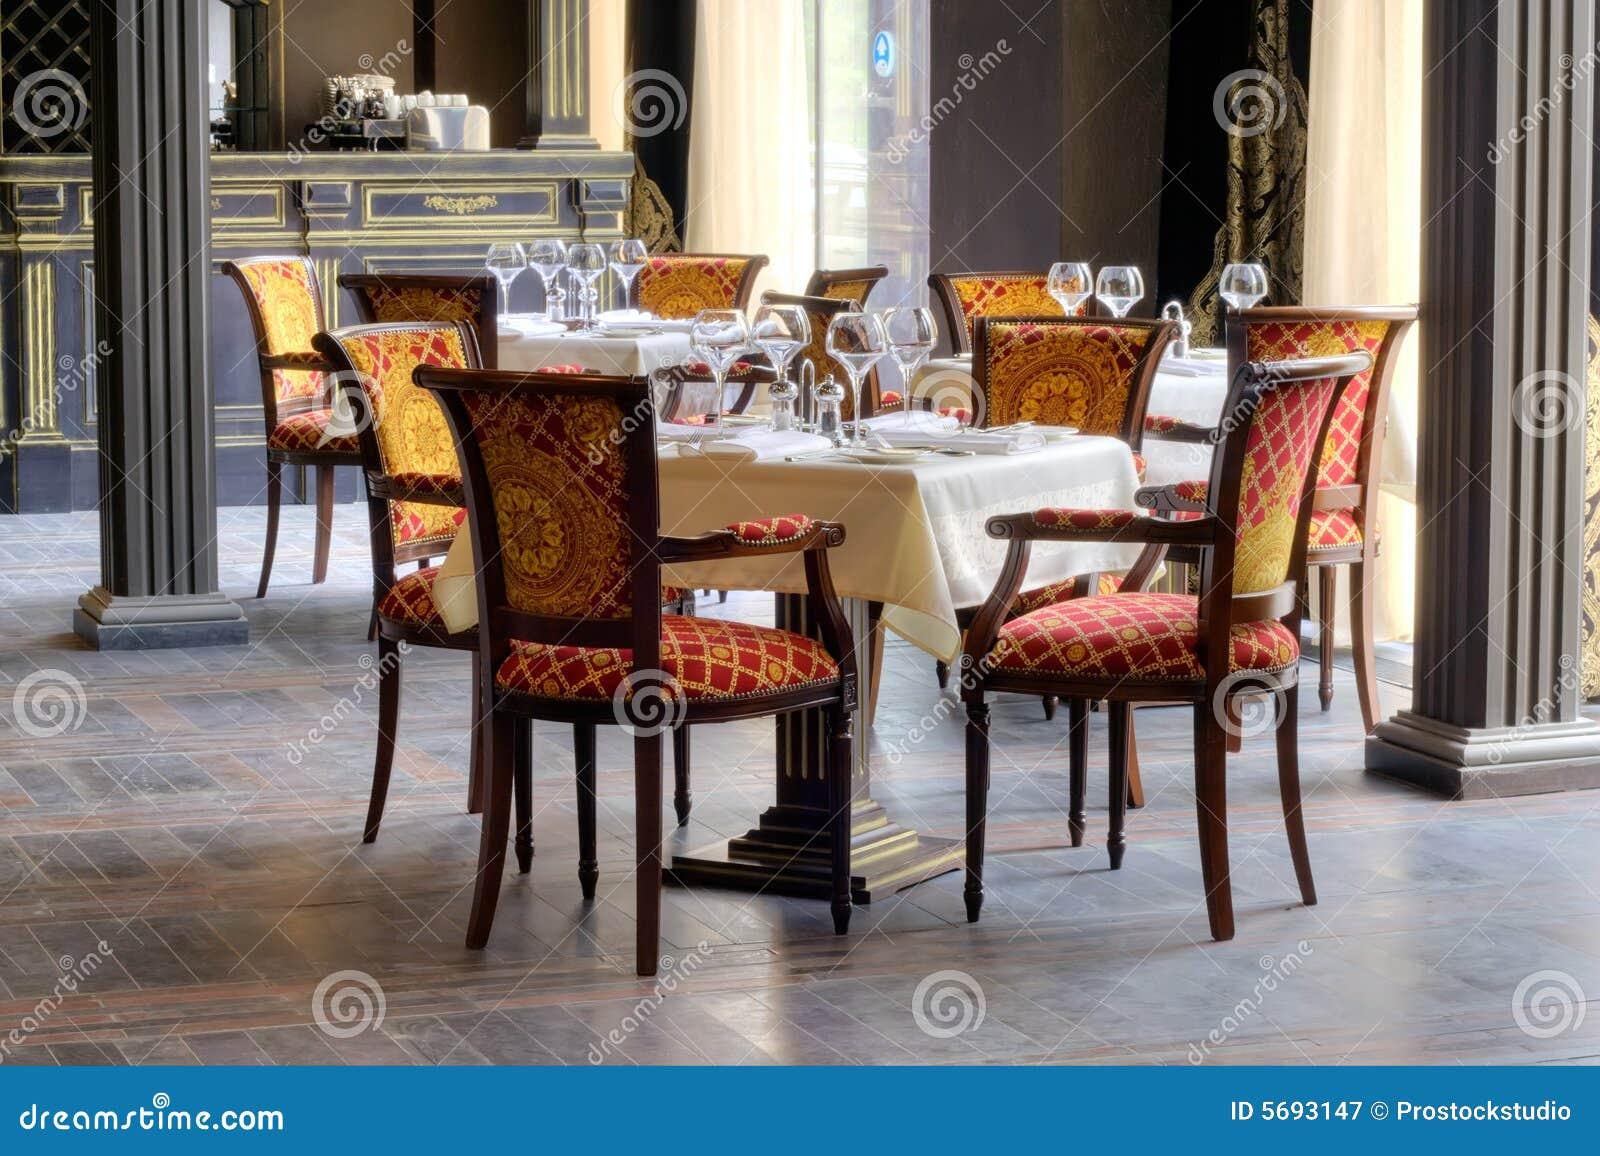 Luxurious restaurant interior royalty free stock